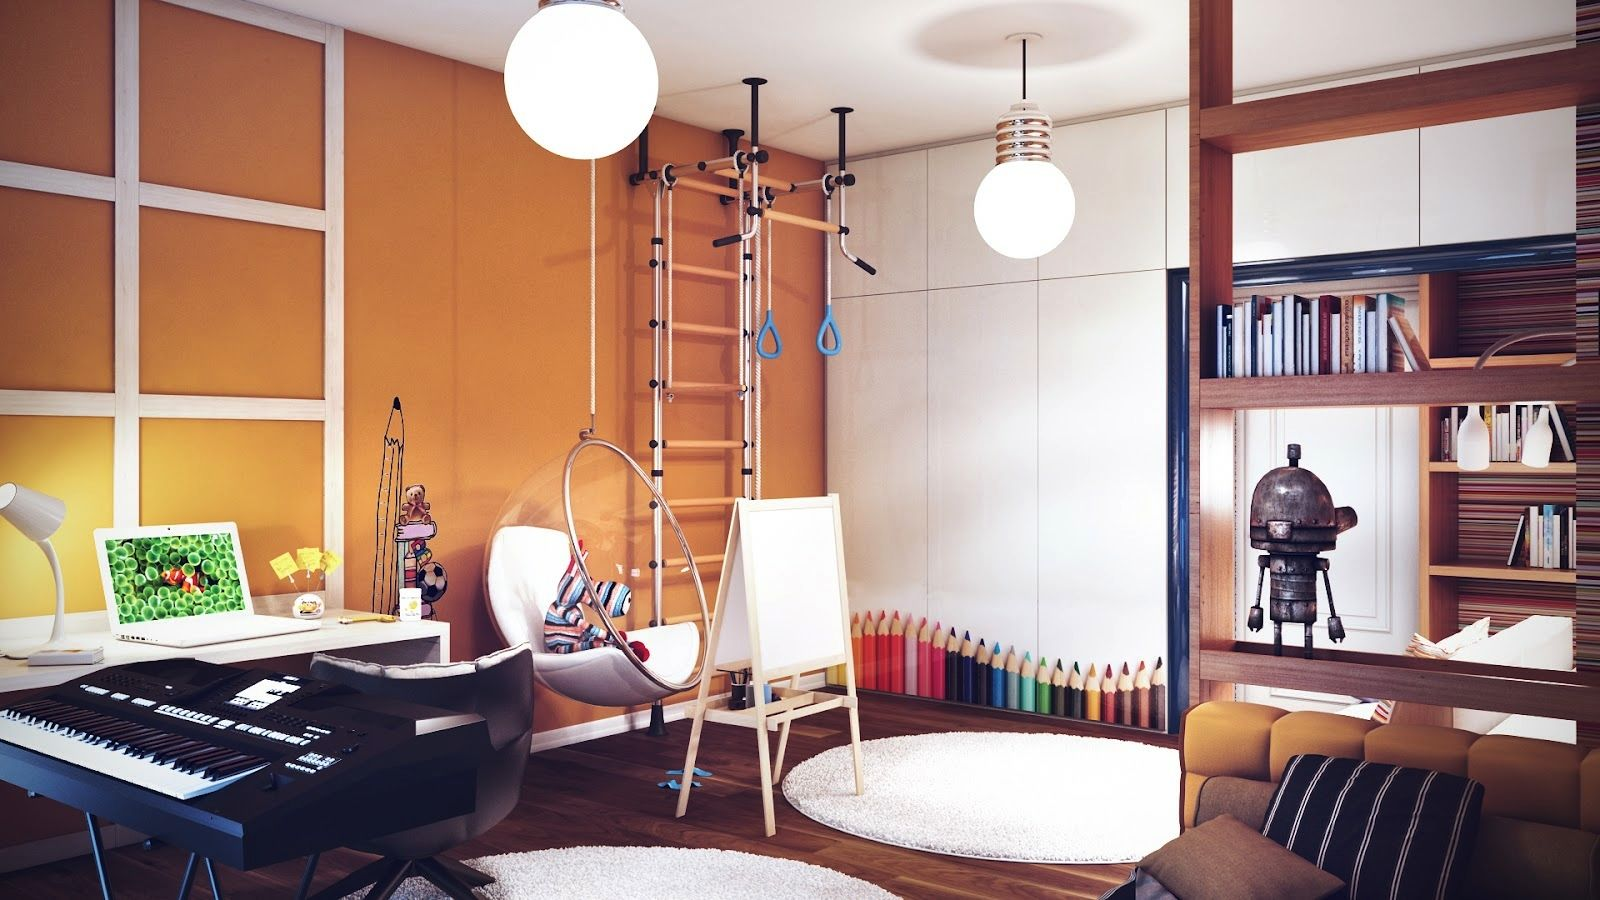 Basement Makeovers For Teenagers Teenage Girls Bedroom Ideas - Cool teenage girl bedroom ideas tumblr